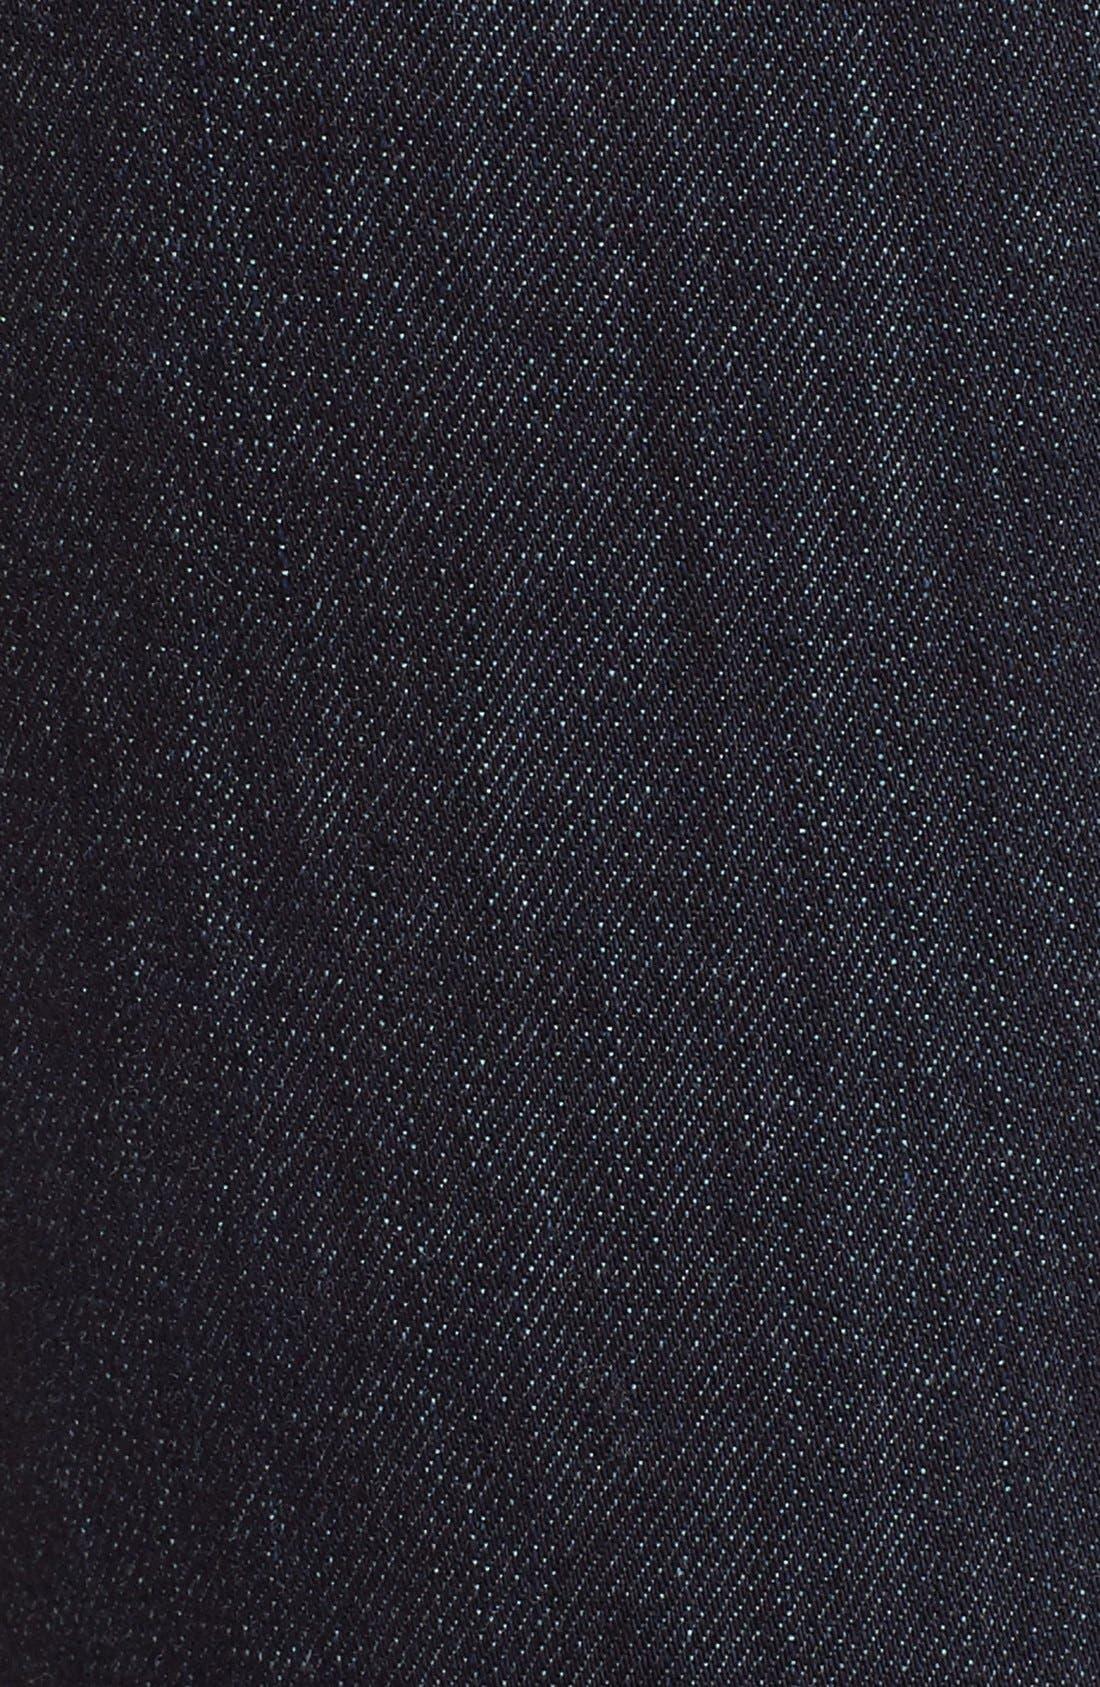 Armani Jeans Bootcut Jeans,                             Alternate thumbnail 4, color,                             400